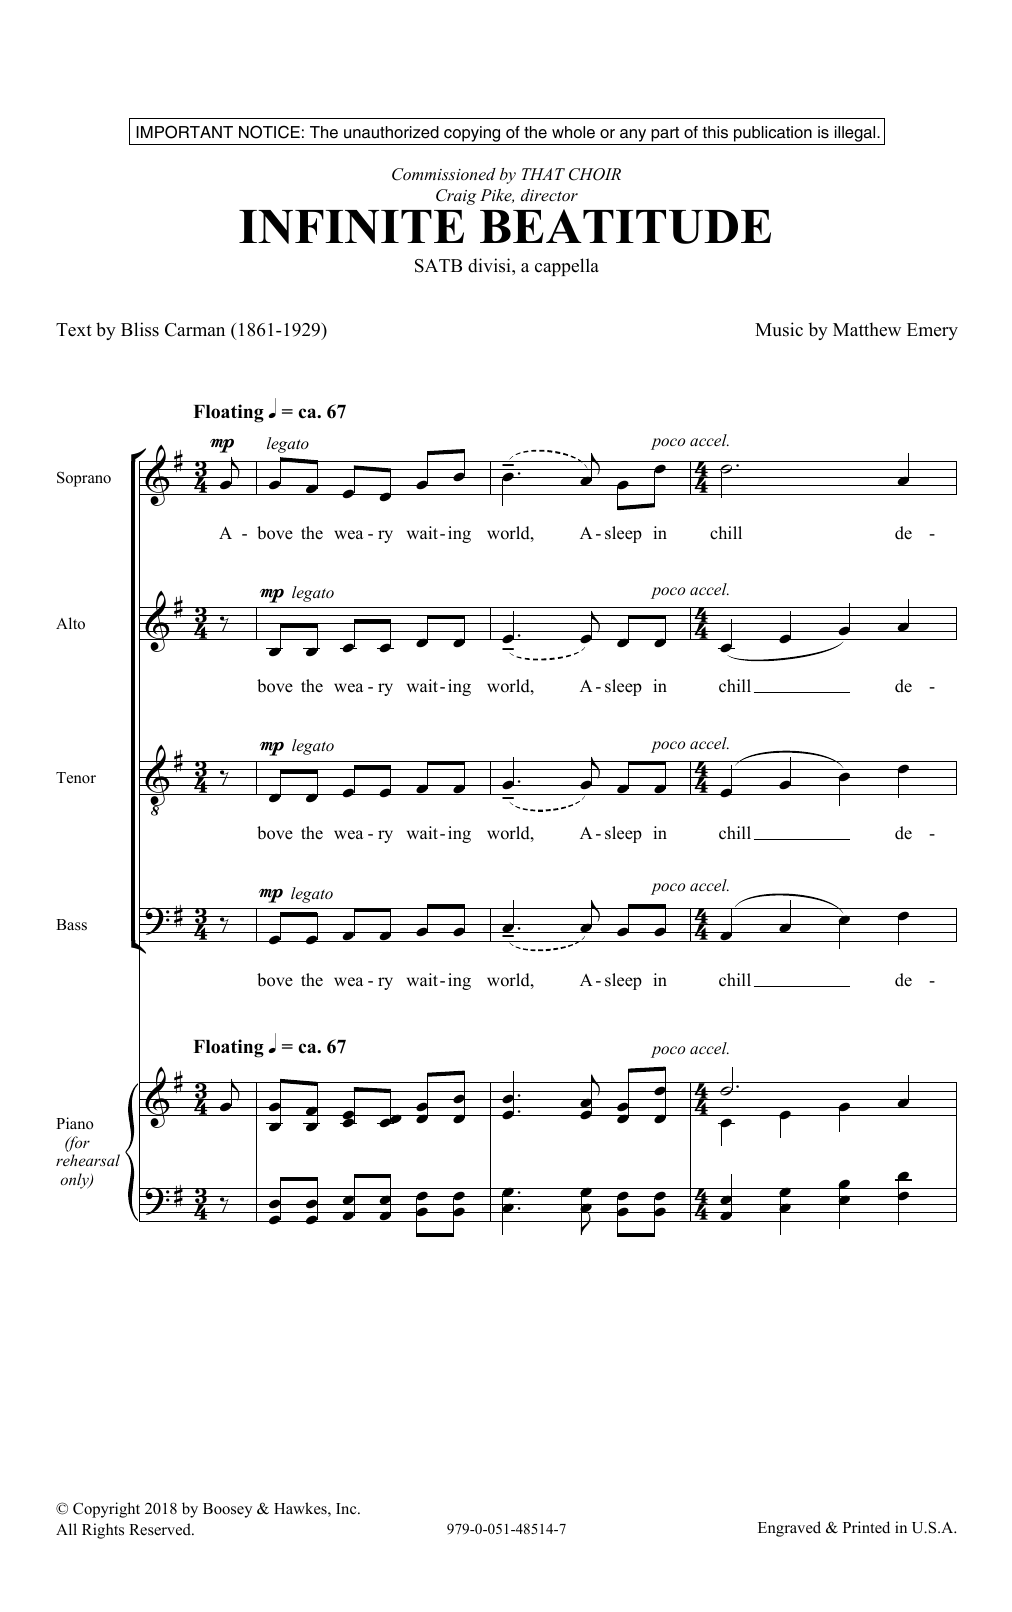 Infinite Beatitude (SATB Choir)